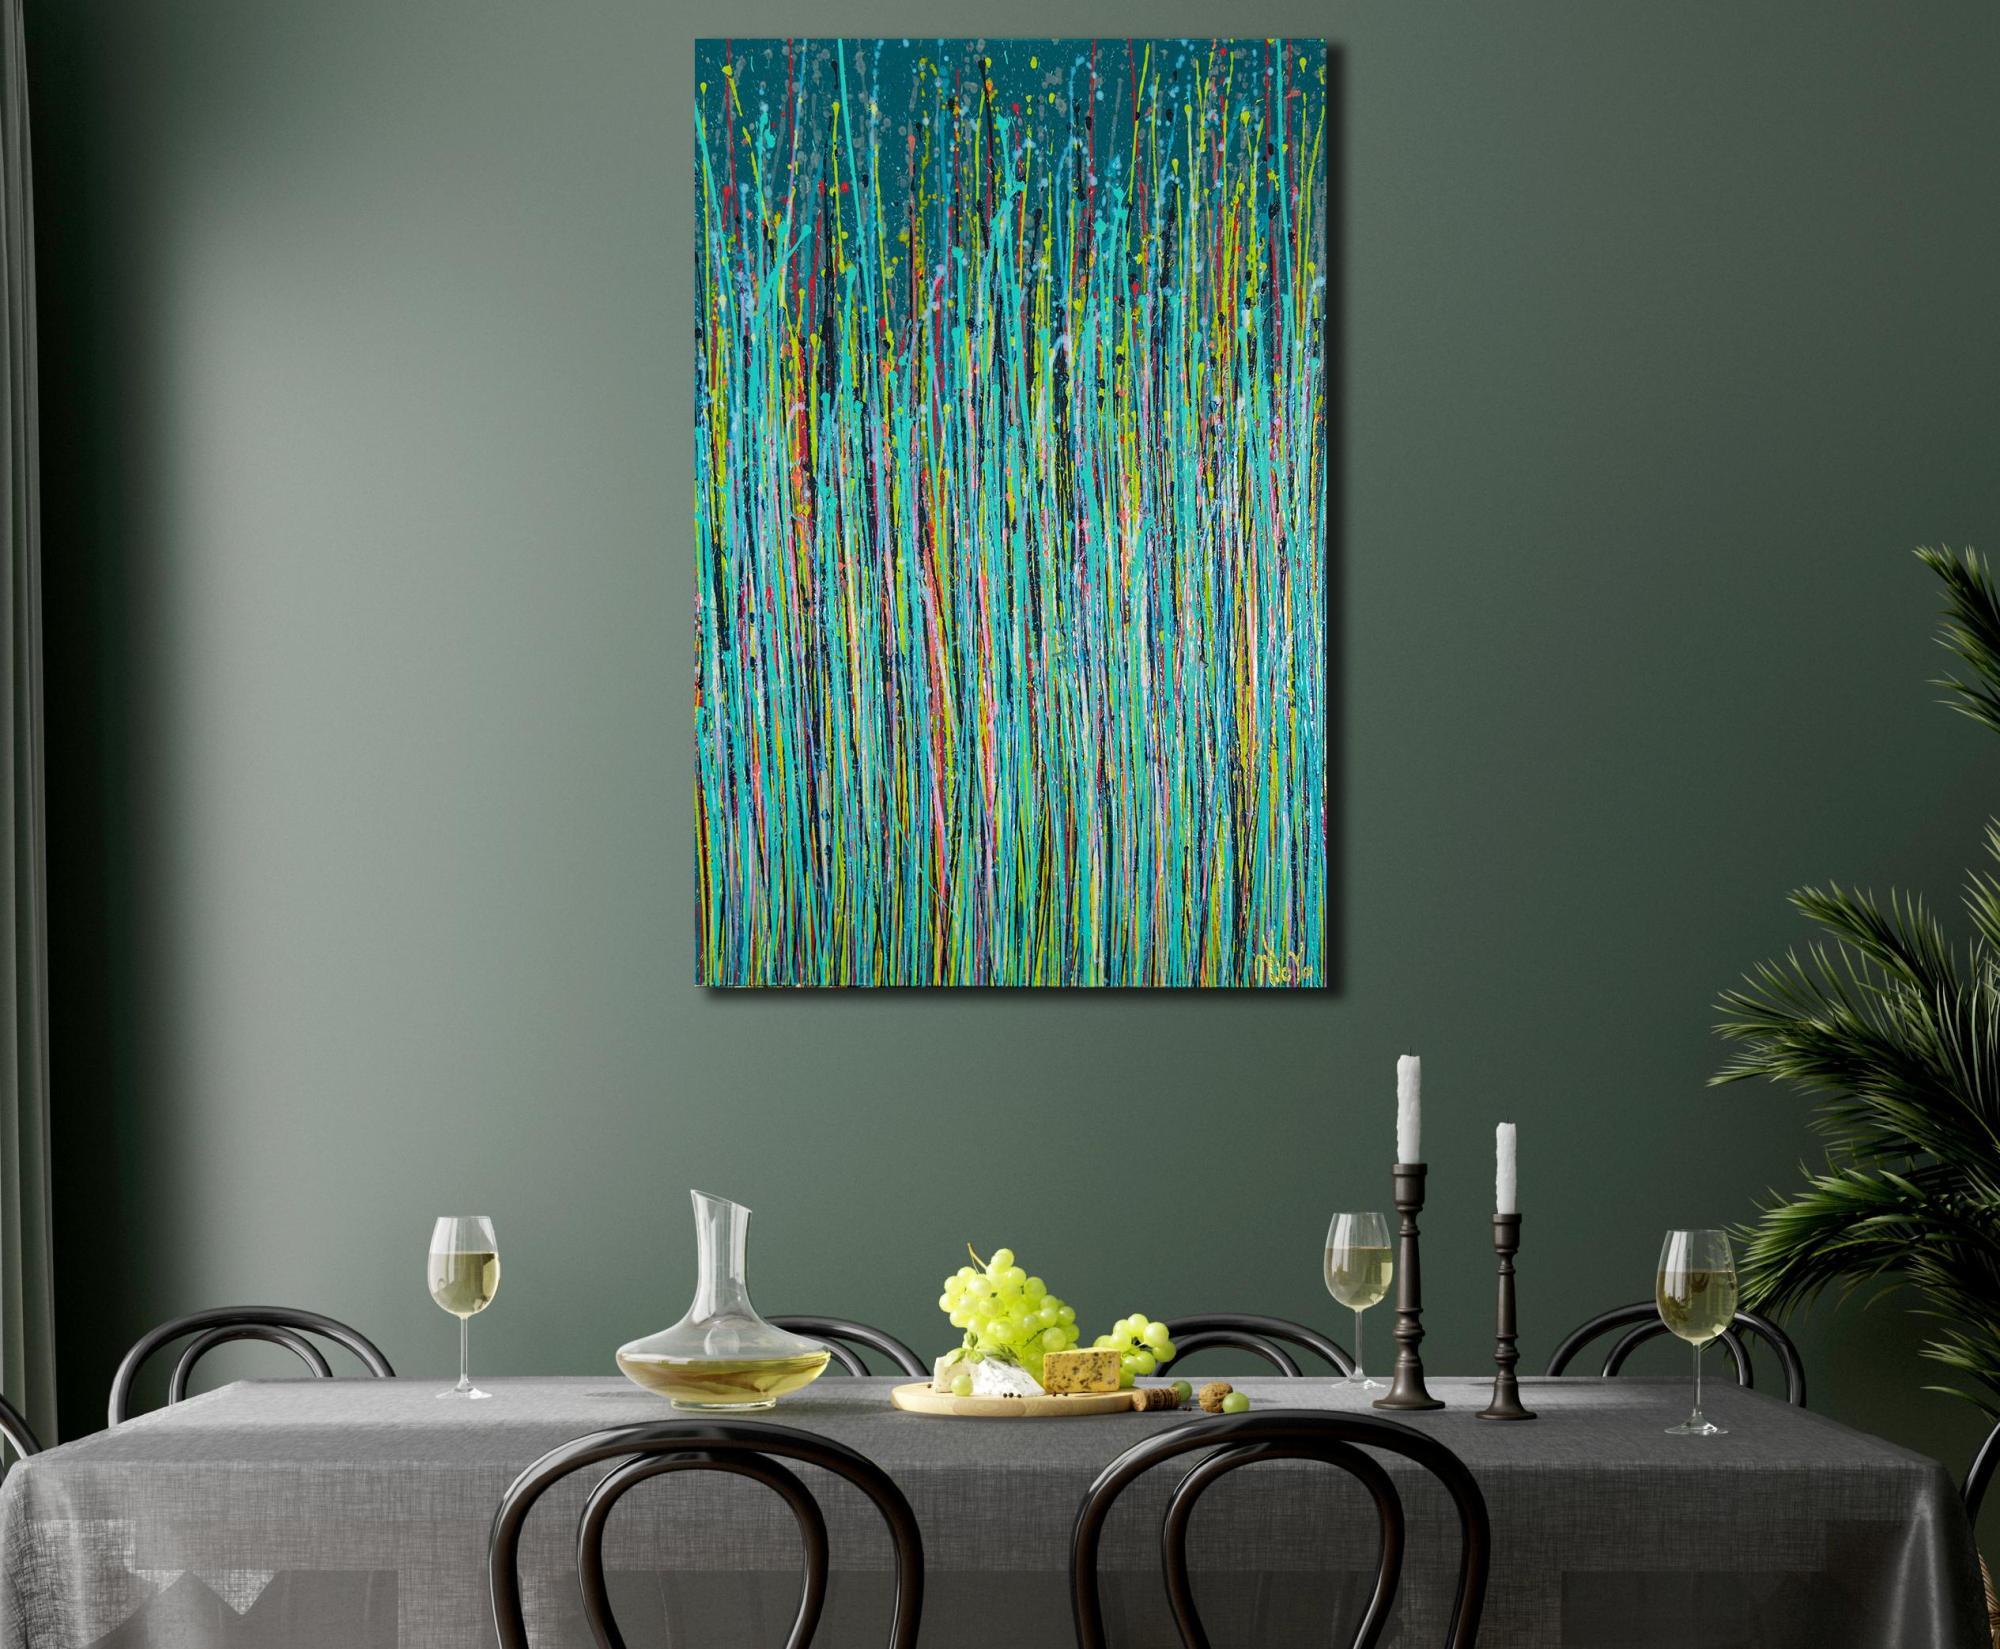 ROOM EXAMPLE / Blue Symphony (Natures Dance) 2 (2021) - 24x36 in / Artist: Nestor Toro